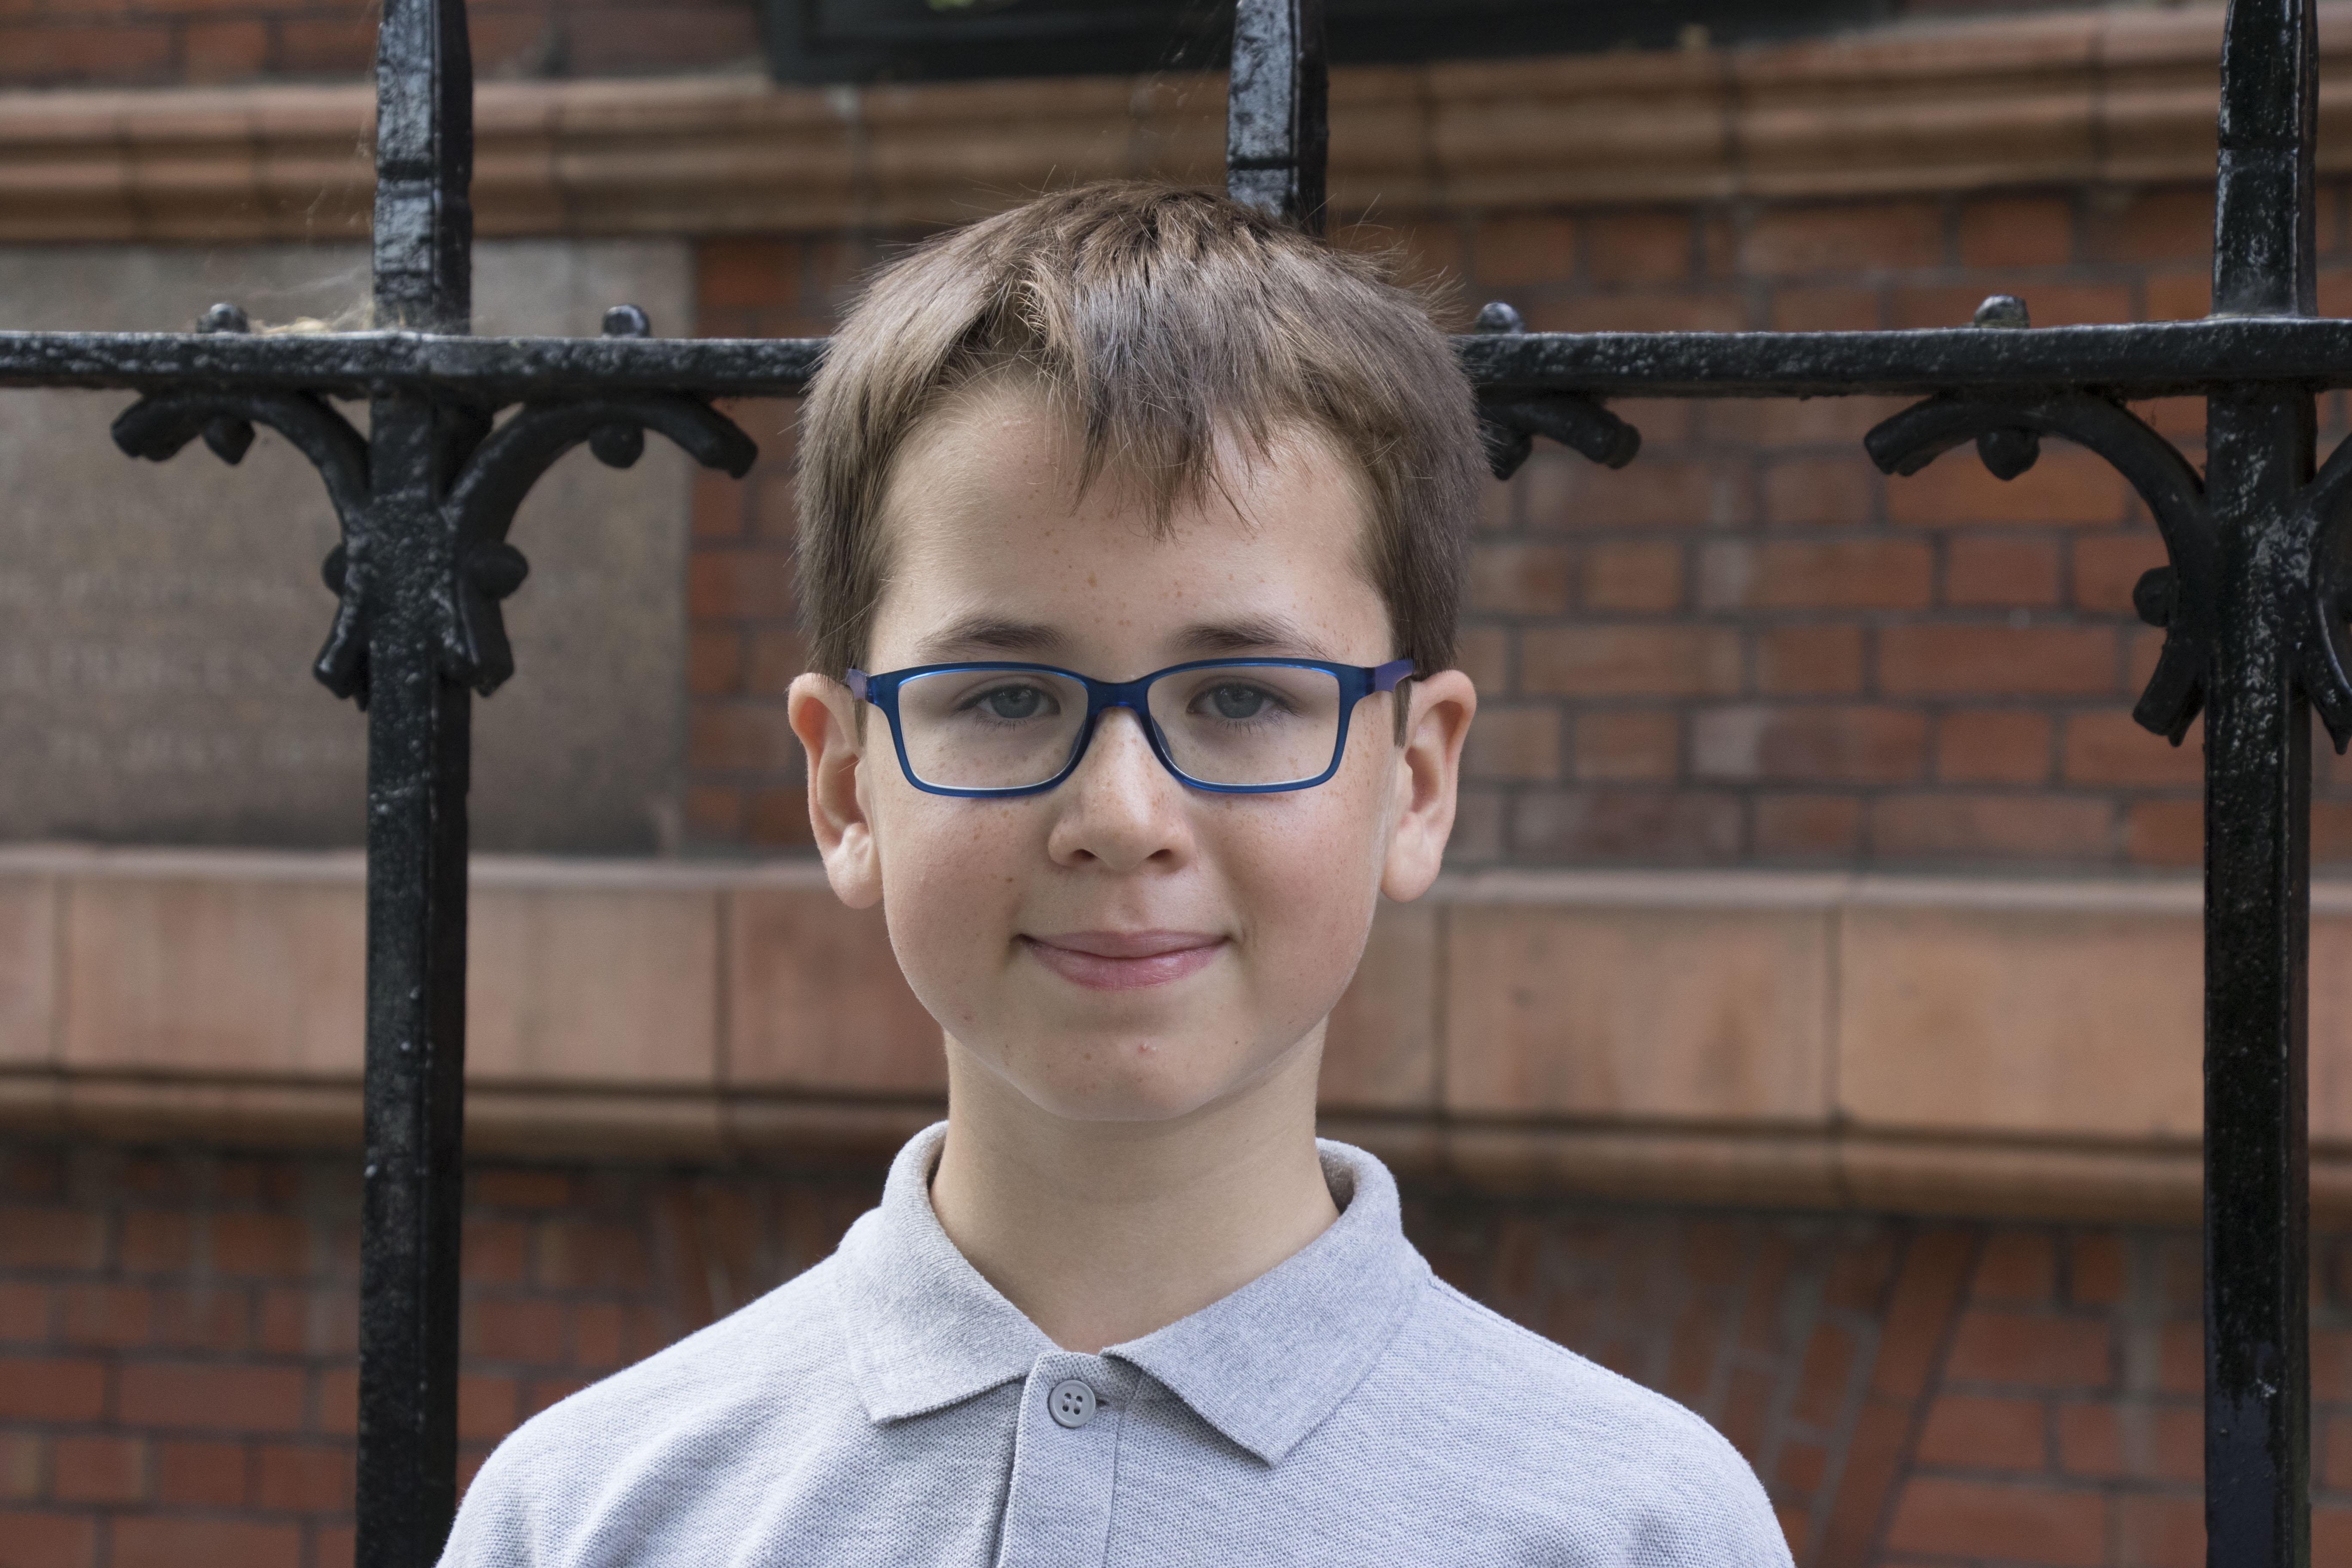 Chris, Aged 9